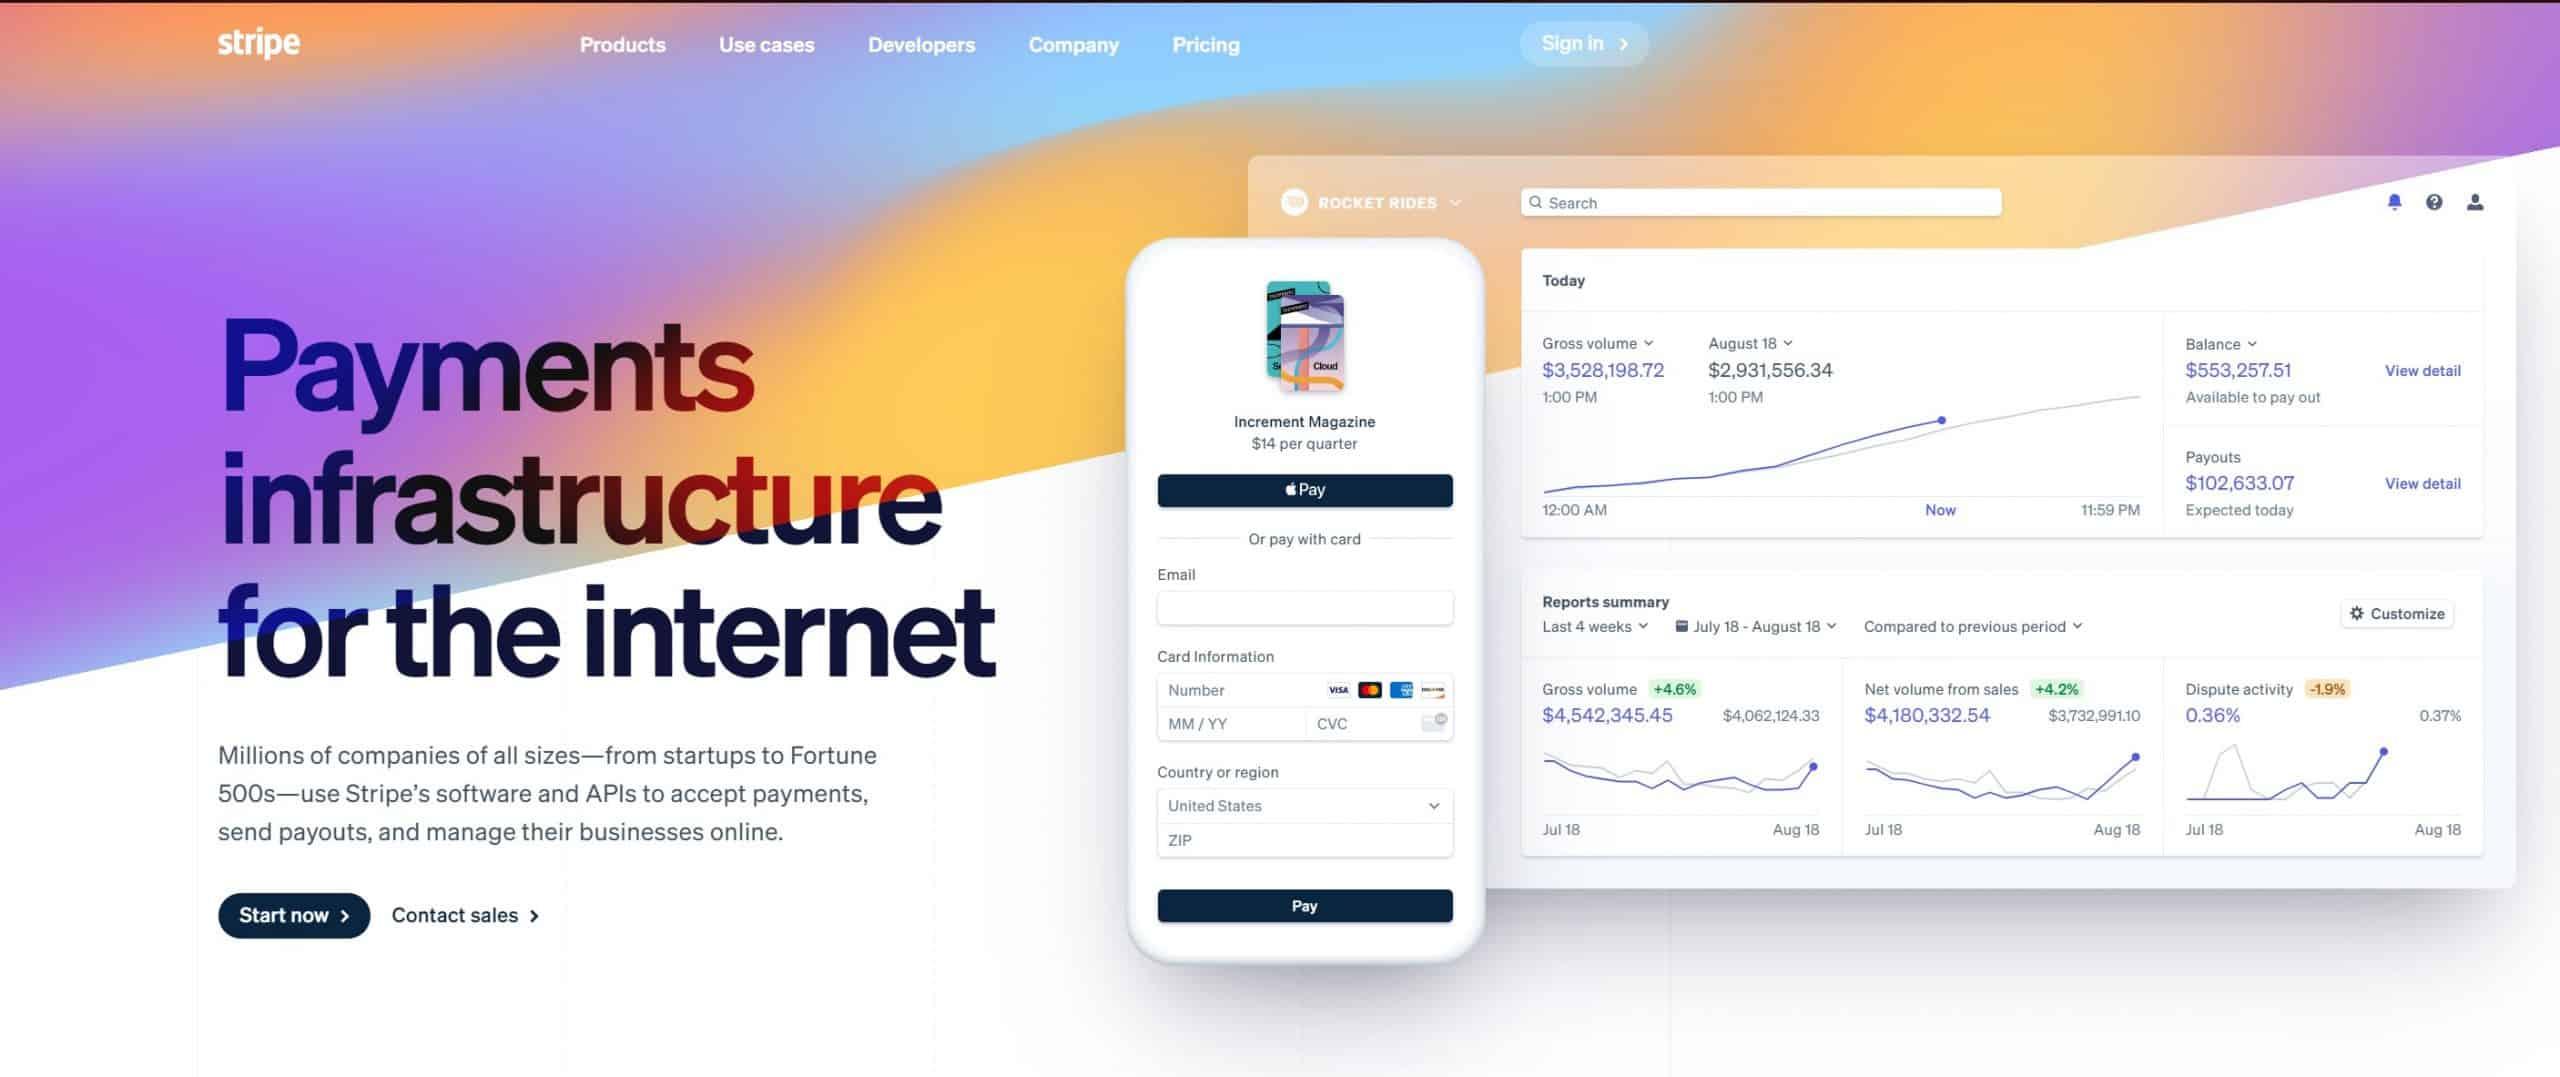 Stripe website screenshot